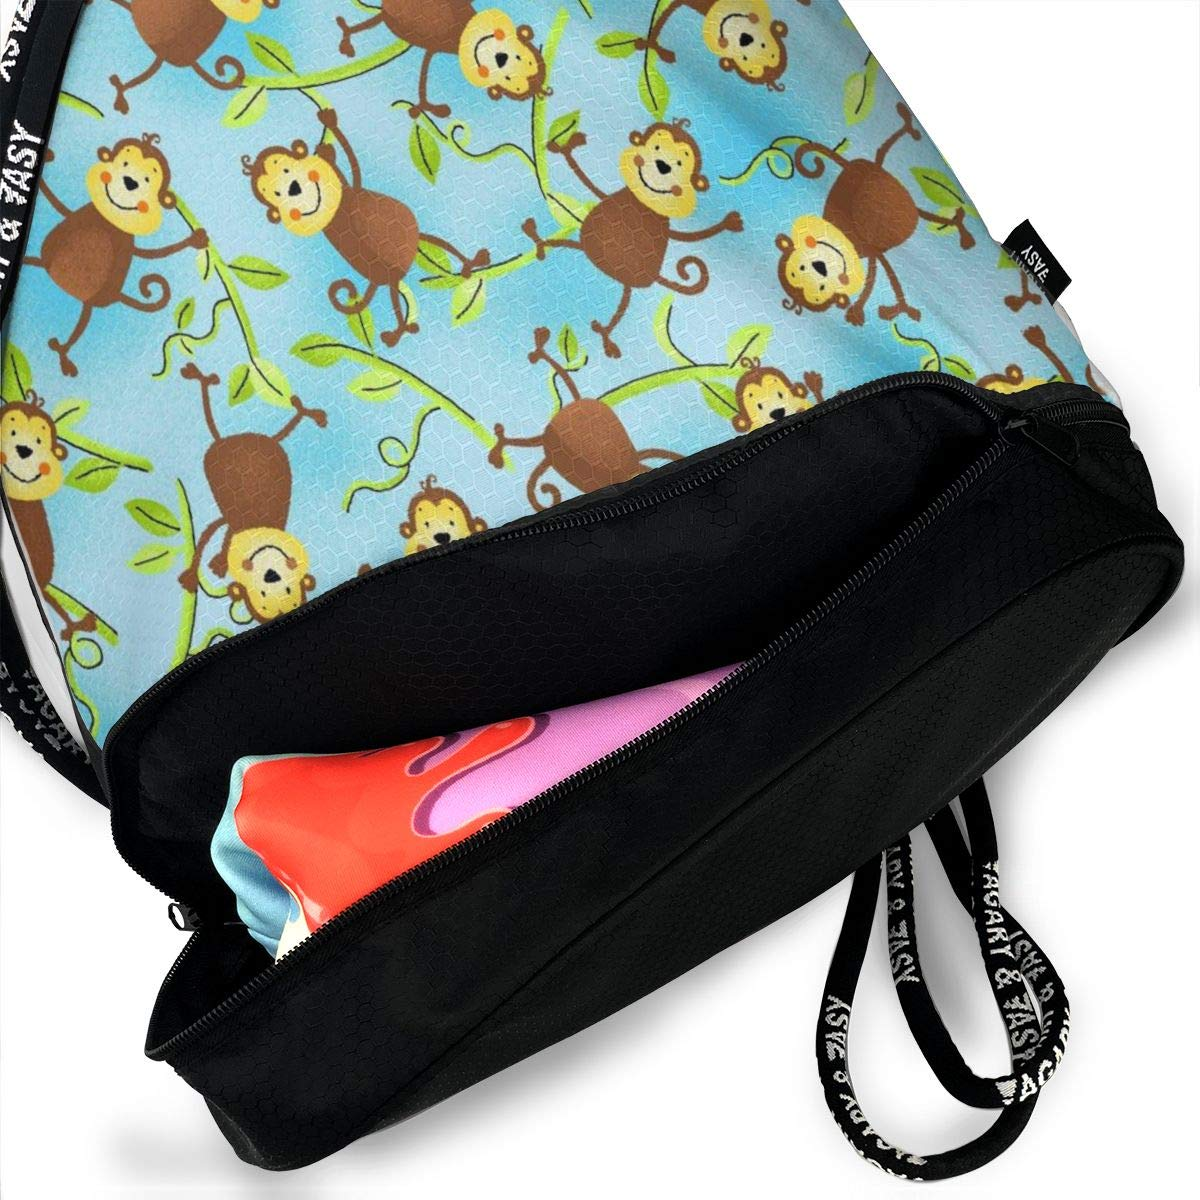 Sport Cinch Pack Backpack for Men Kji Gym Sack Drawstring Bag Monkeys Blue On Vines Printed Sackpack Women